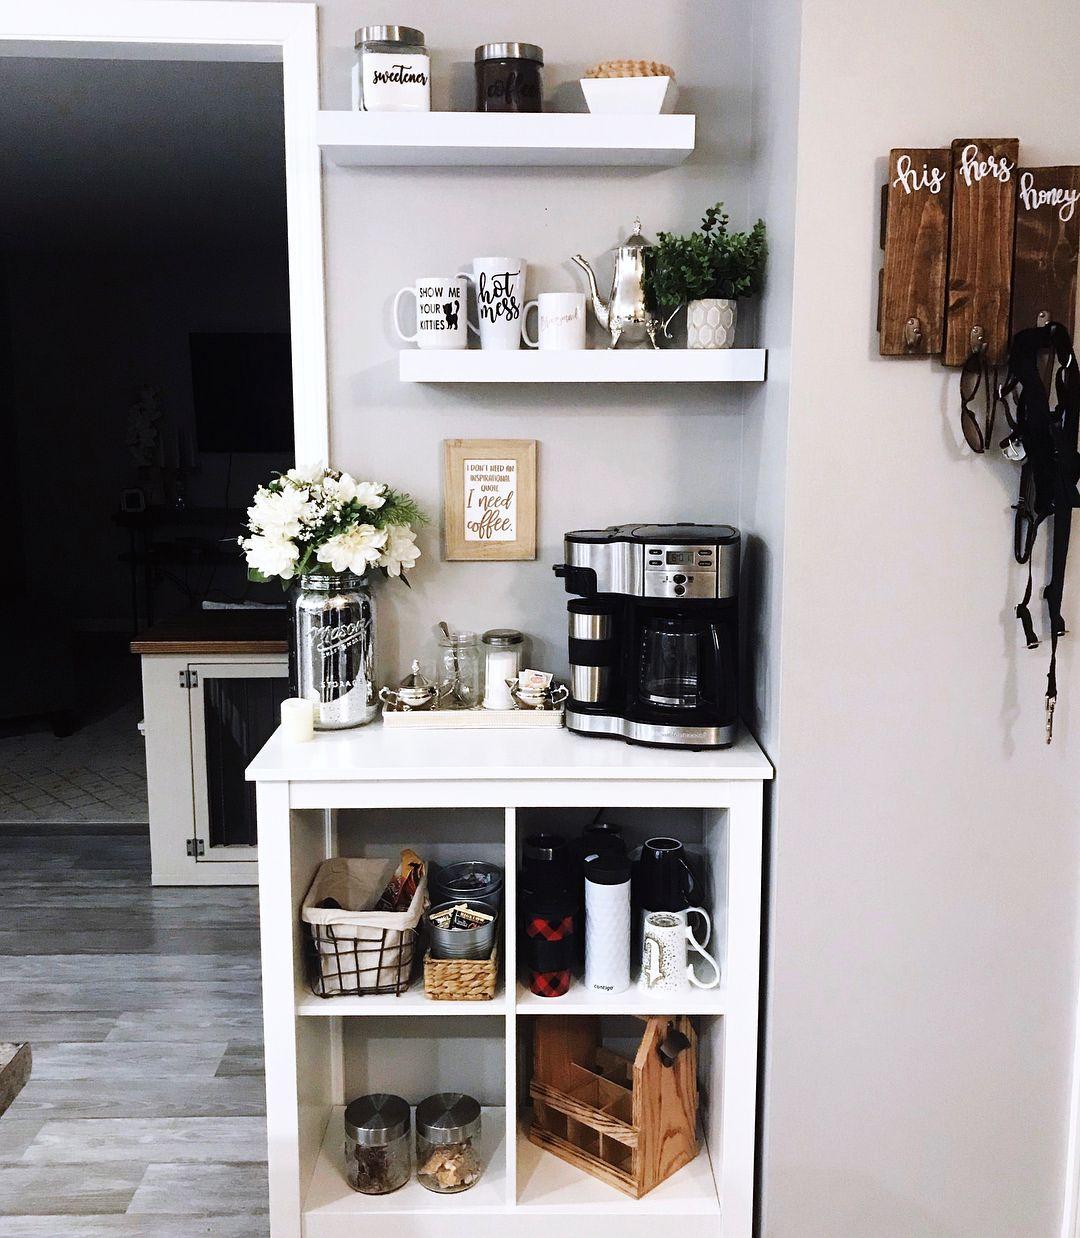 "Tanya Stier on Instagram: ""My new little coffee bar"